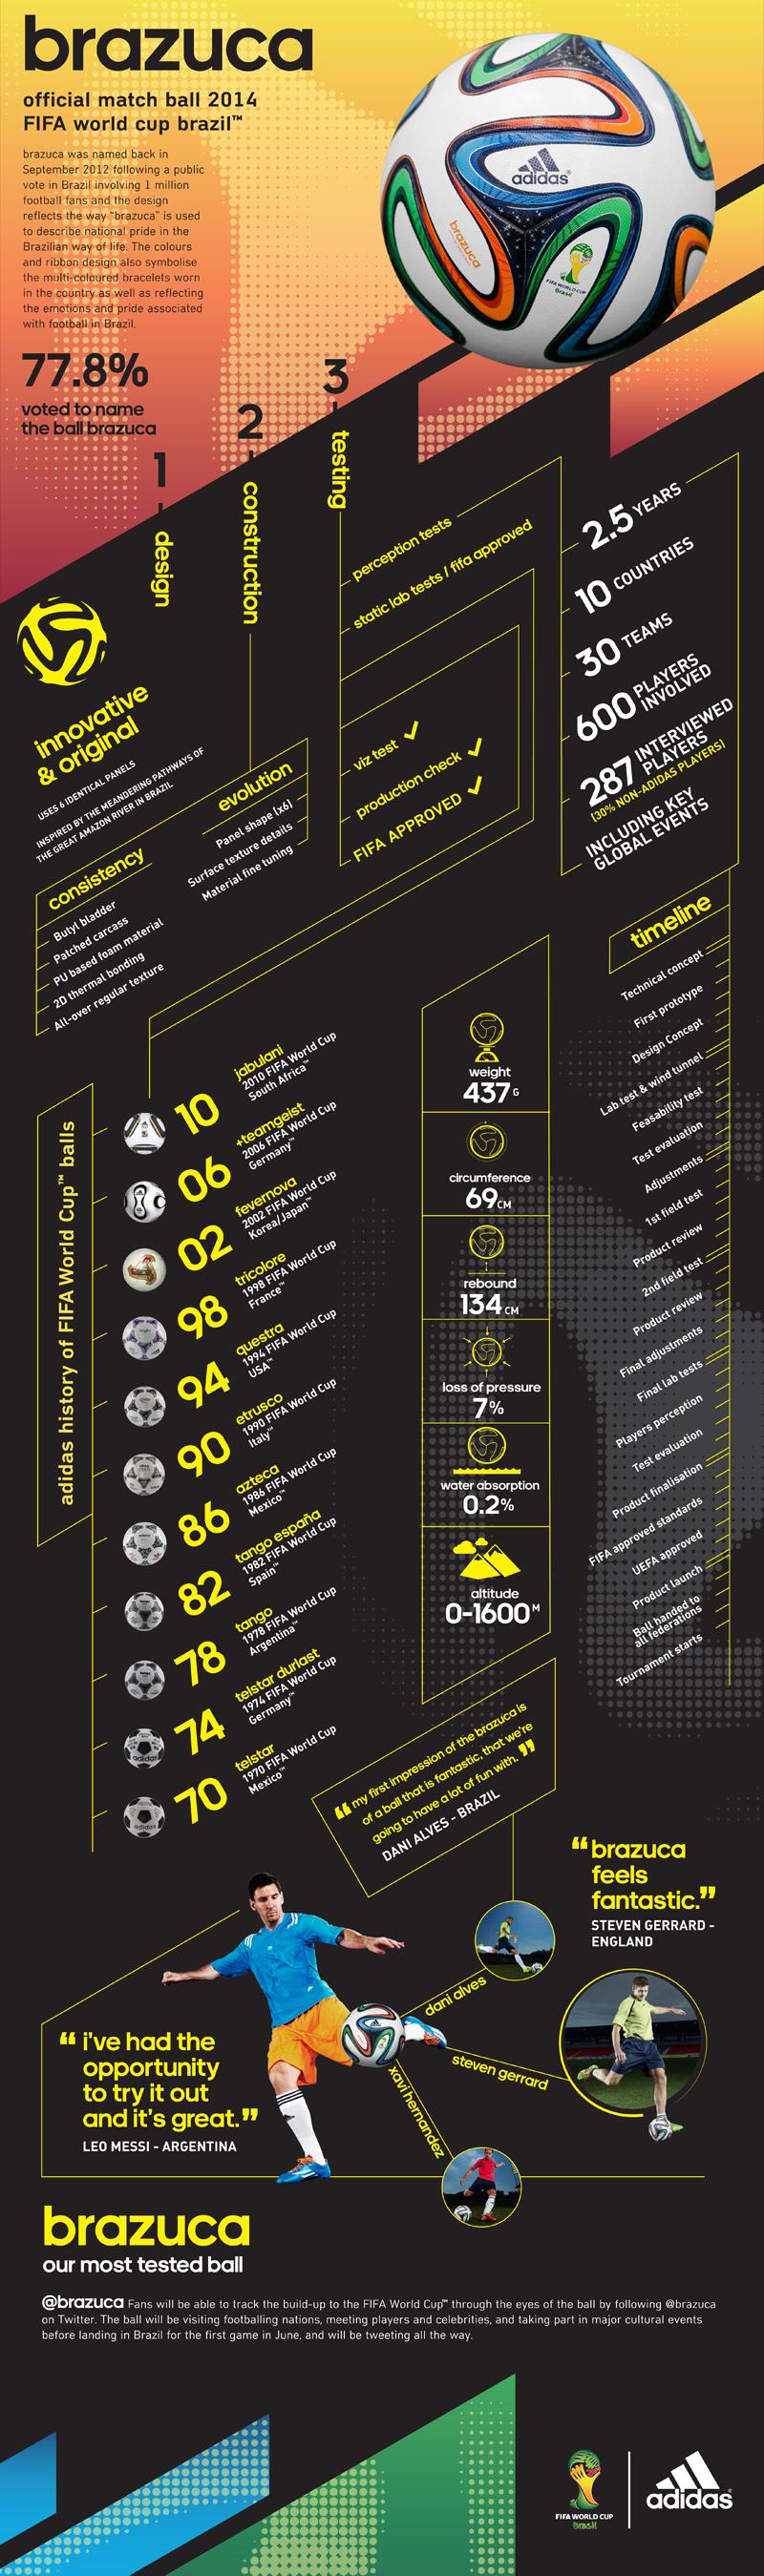 HKS_10615 Adidas Infographic_Portrait